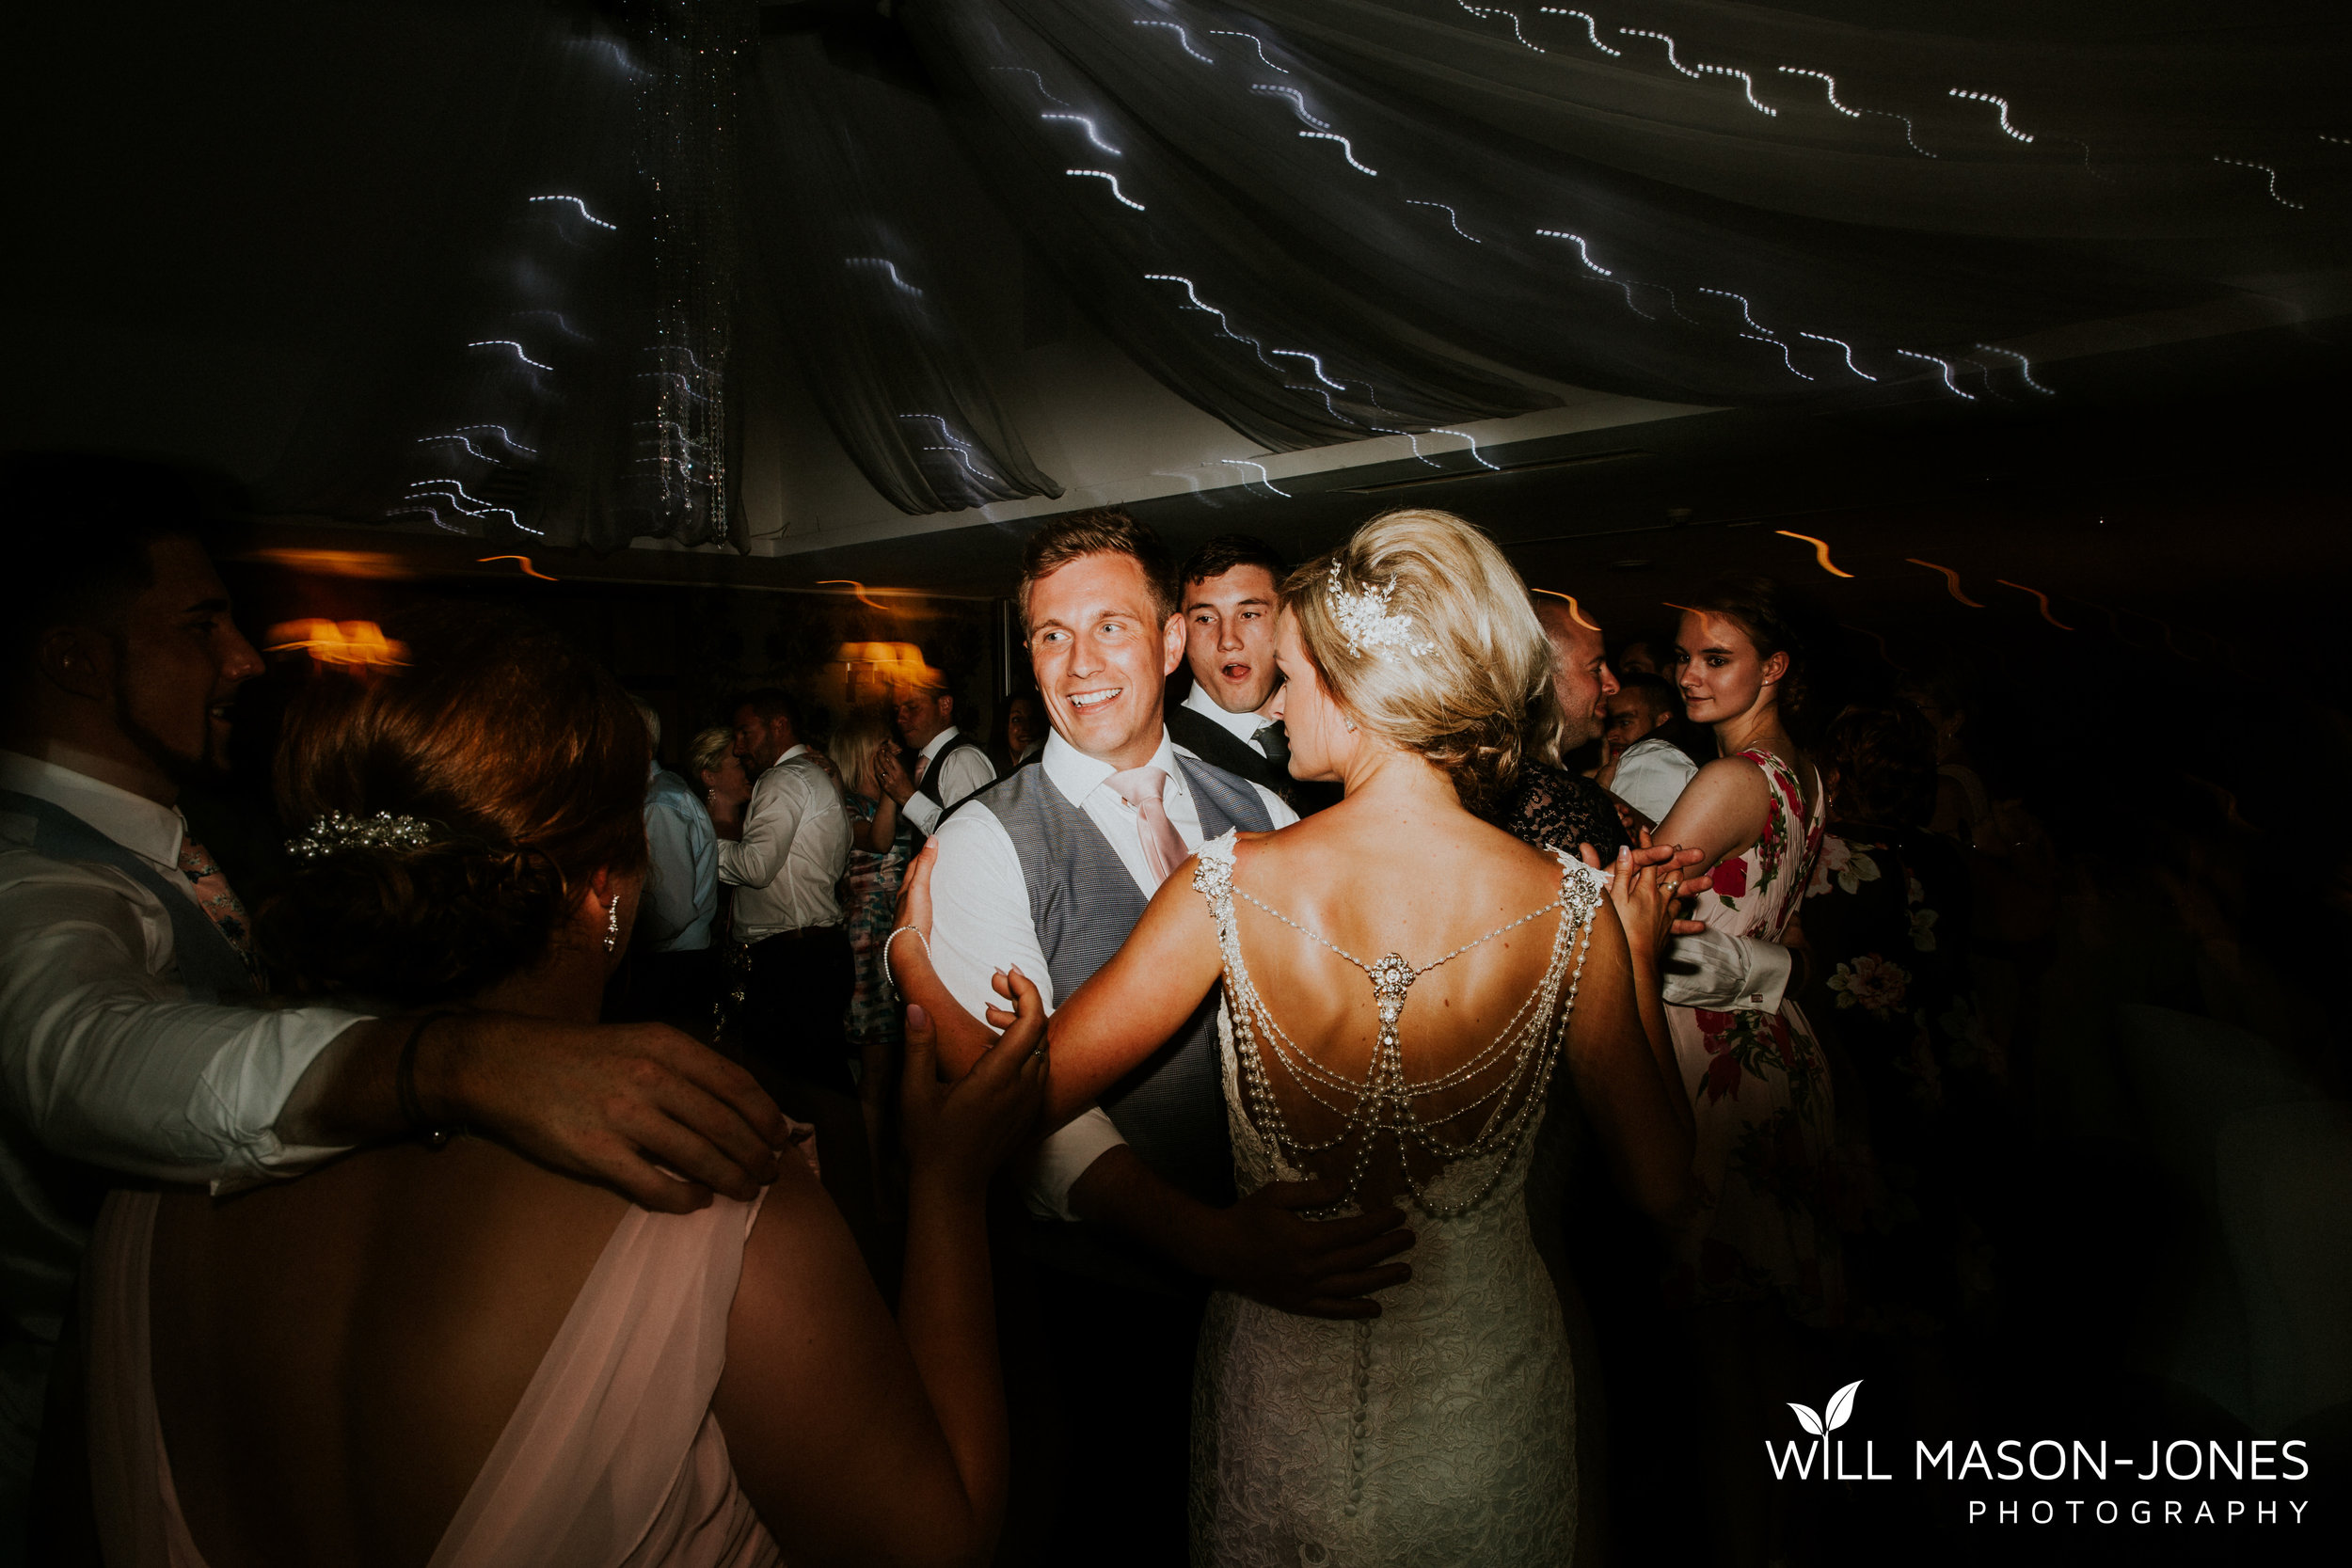 loch-lomond-destination-wedding-photographer-scotland-uk-wales-98.jpg